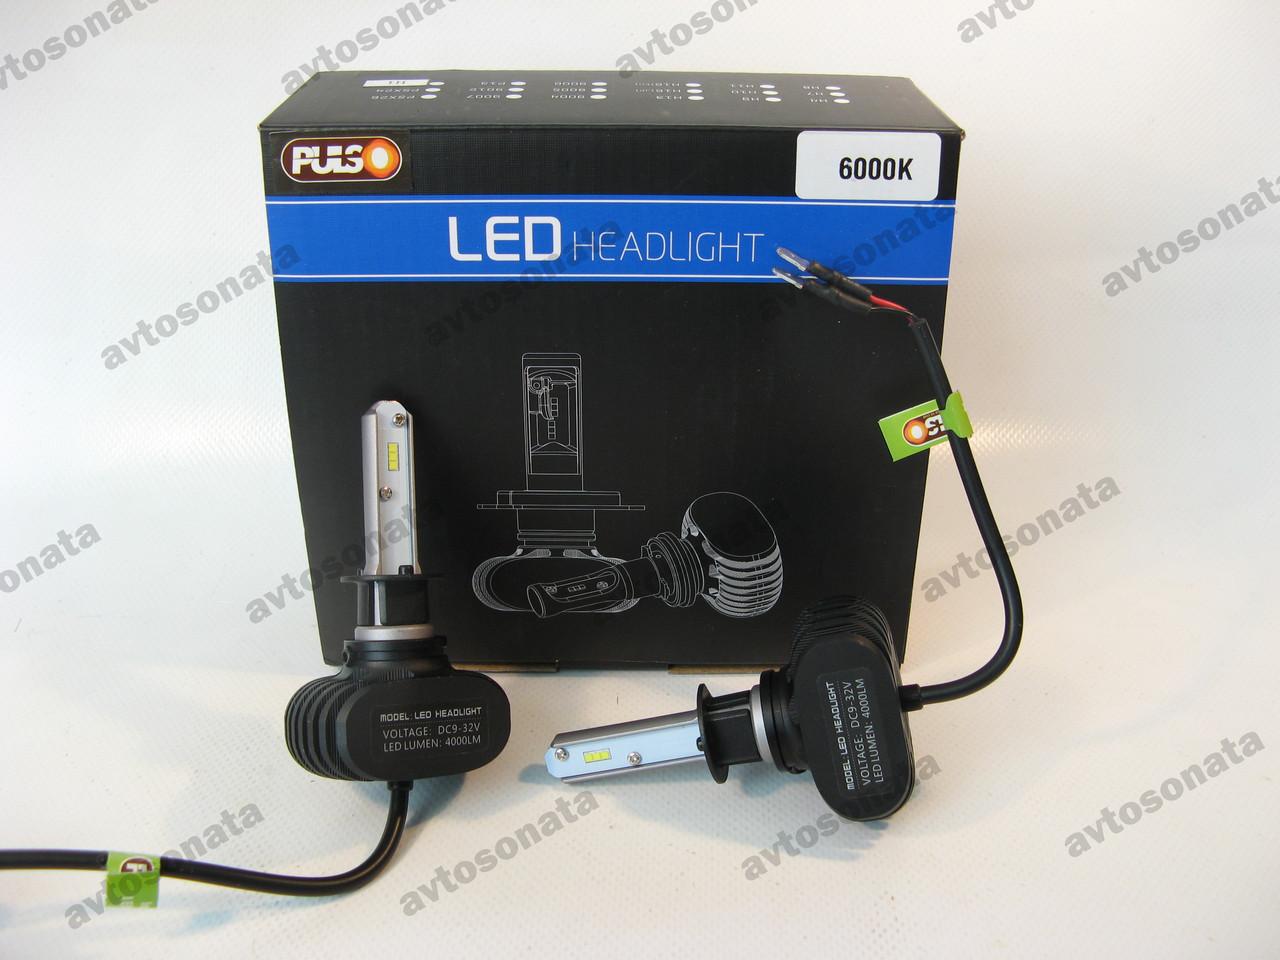 Светодиодные лампы H1 PULSO S1/LED-chips CPS/9-32v25w/4000Lm/6000K